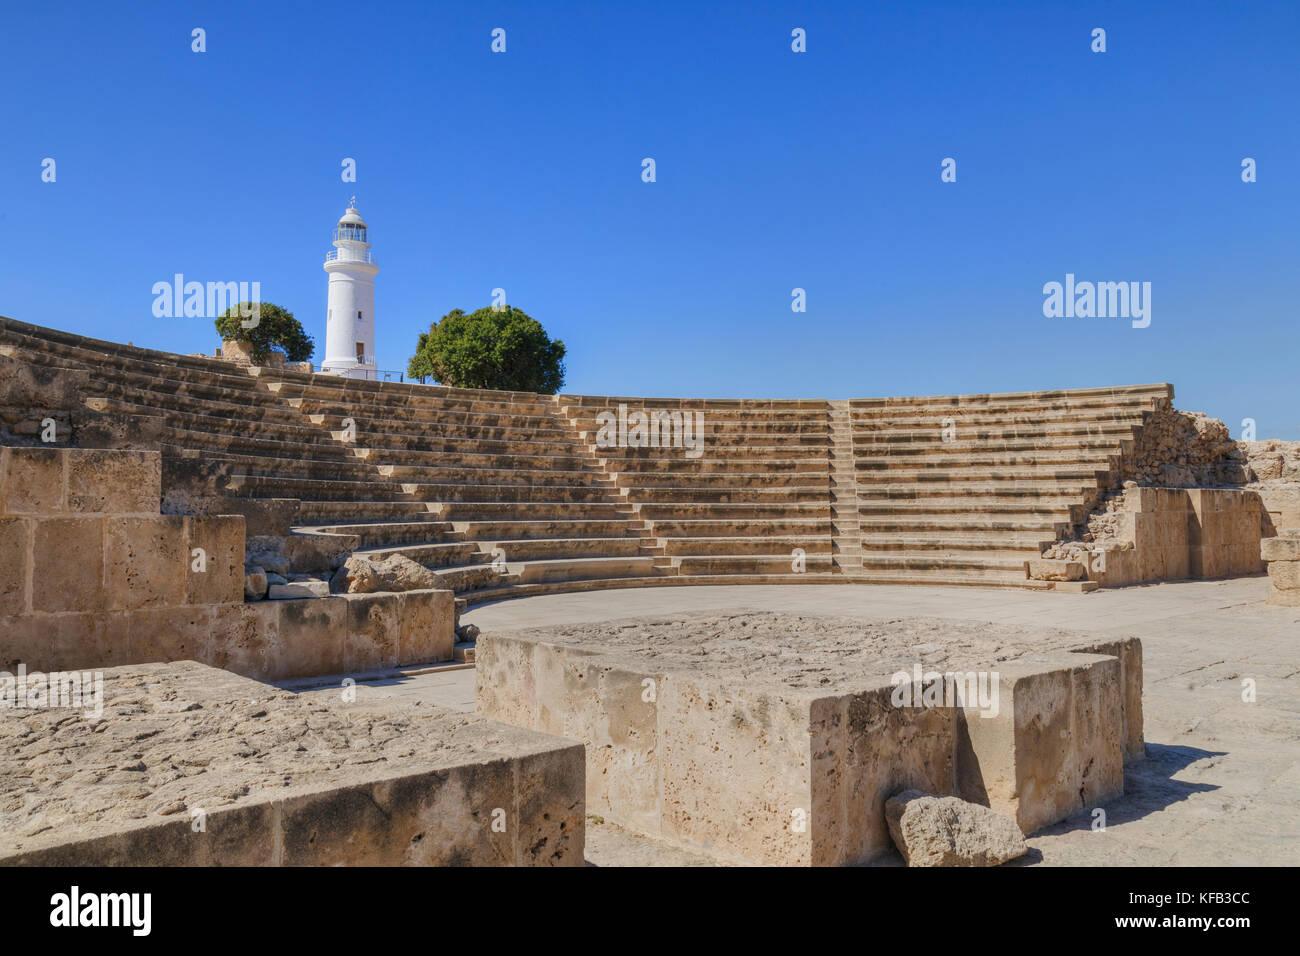 Paphos Archaeological Park, Paphos, Cyprus - Stock Image